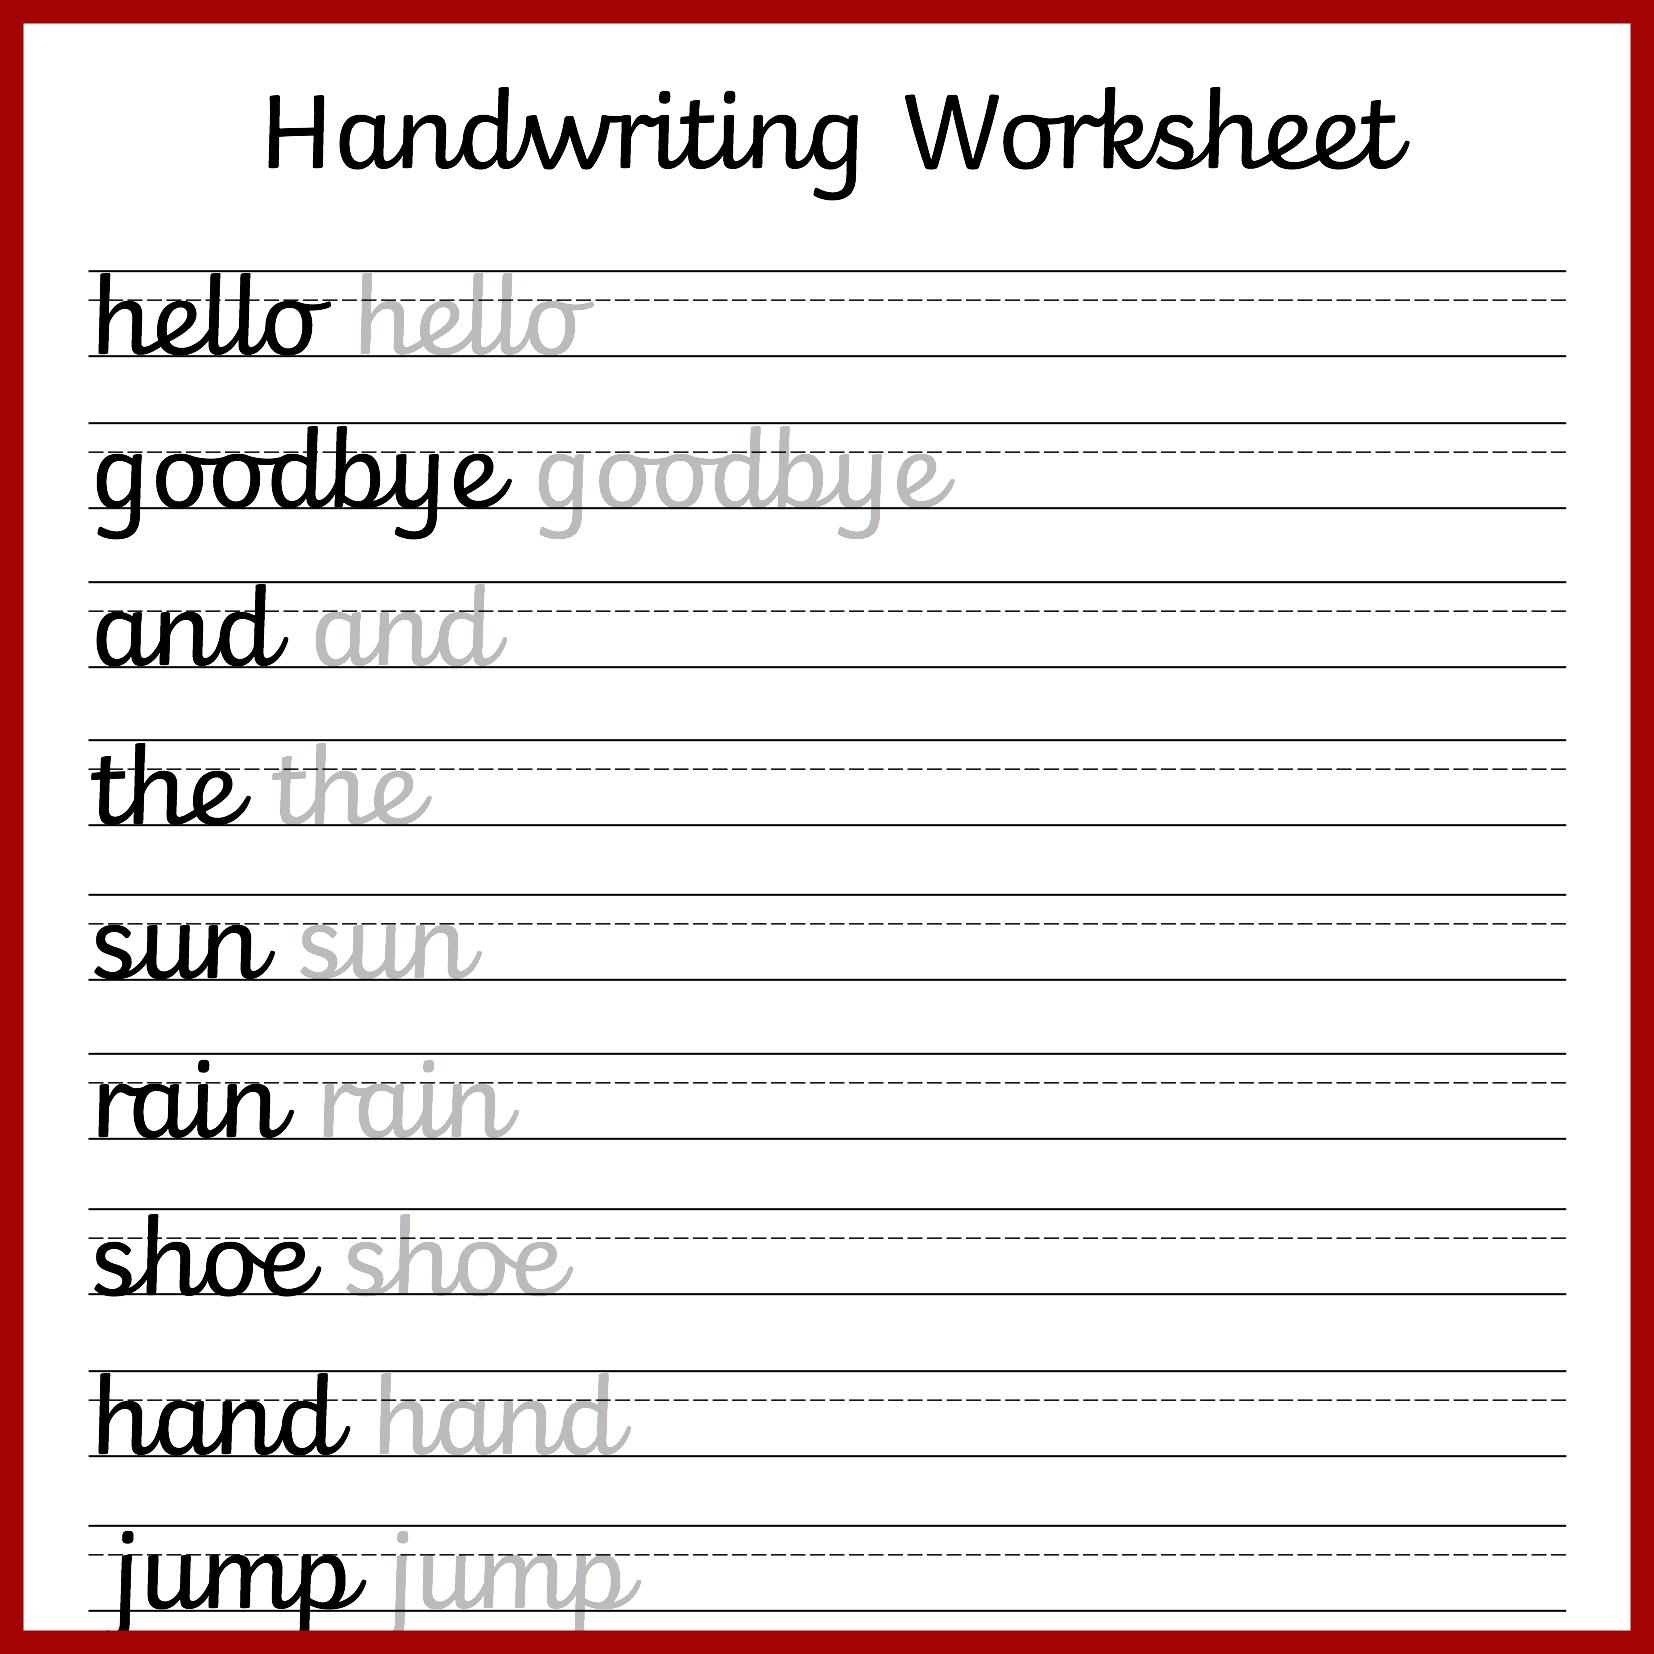 Cursive Handwriting Worksheets – Free Printable! ⋆ Mama Geek | Printable Blank Handwriting Worksheets